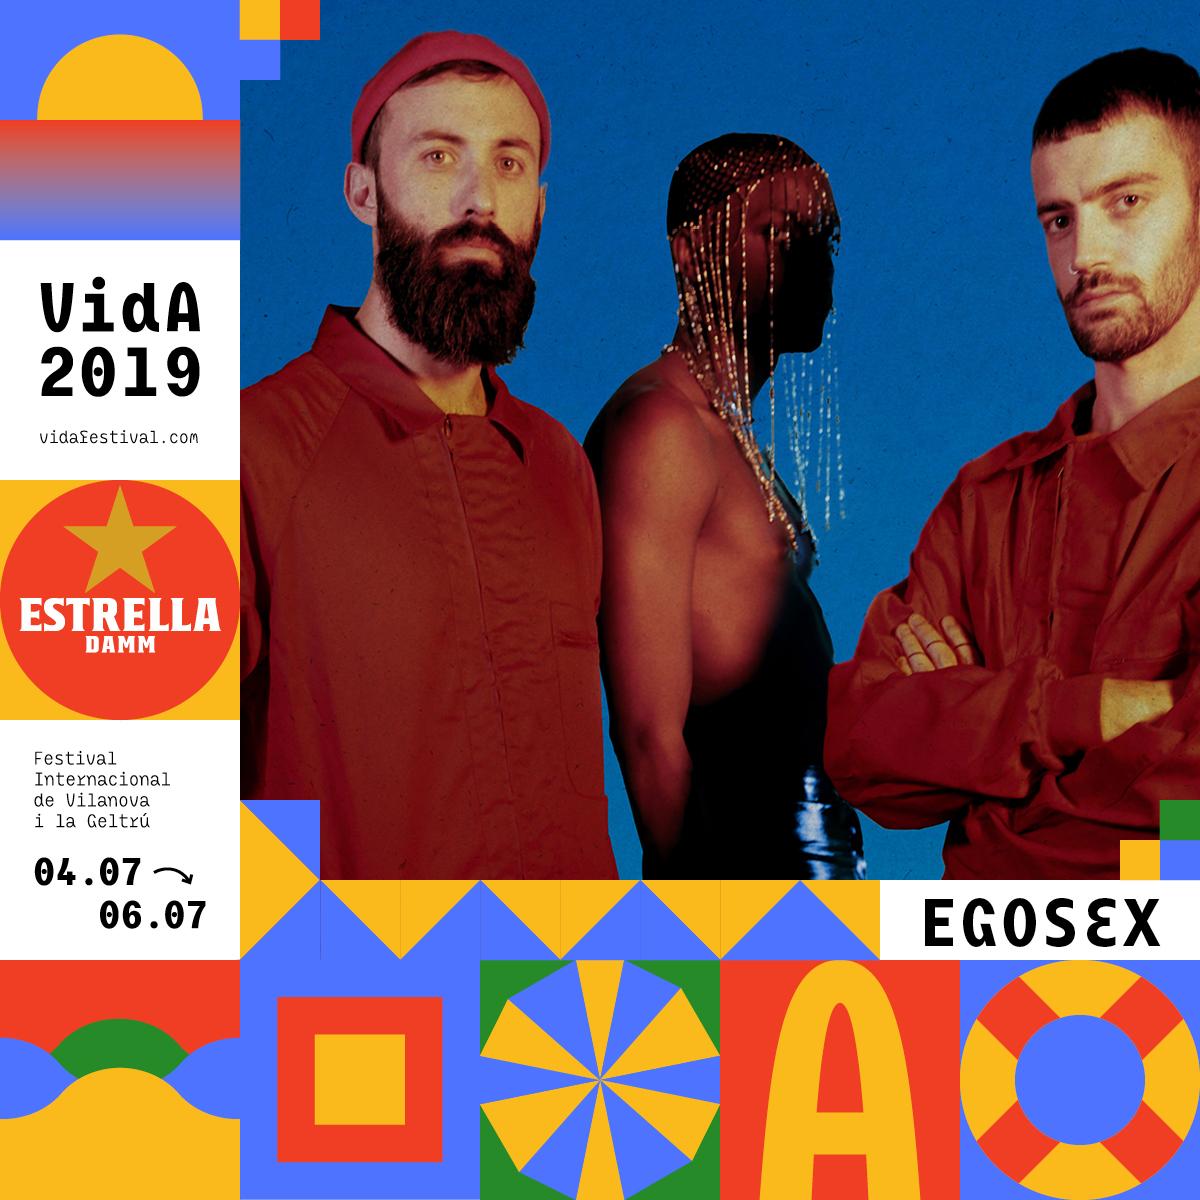 egosex-1200x1200px.jpg